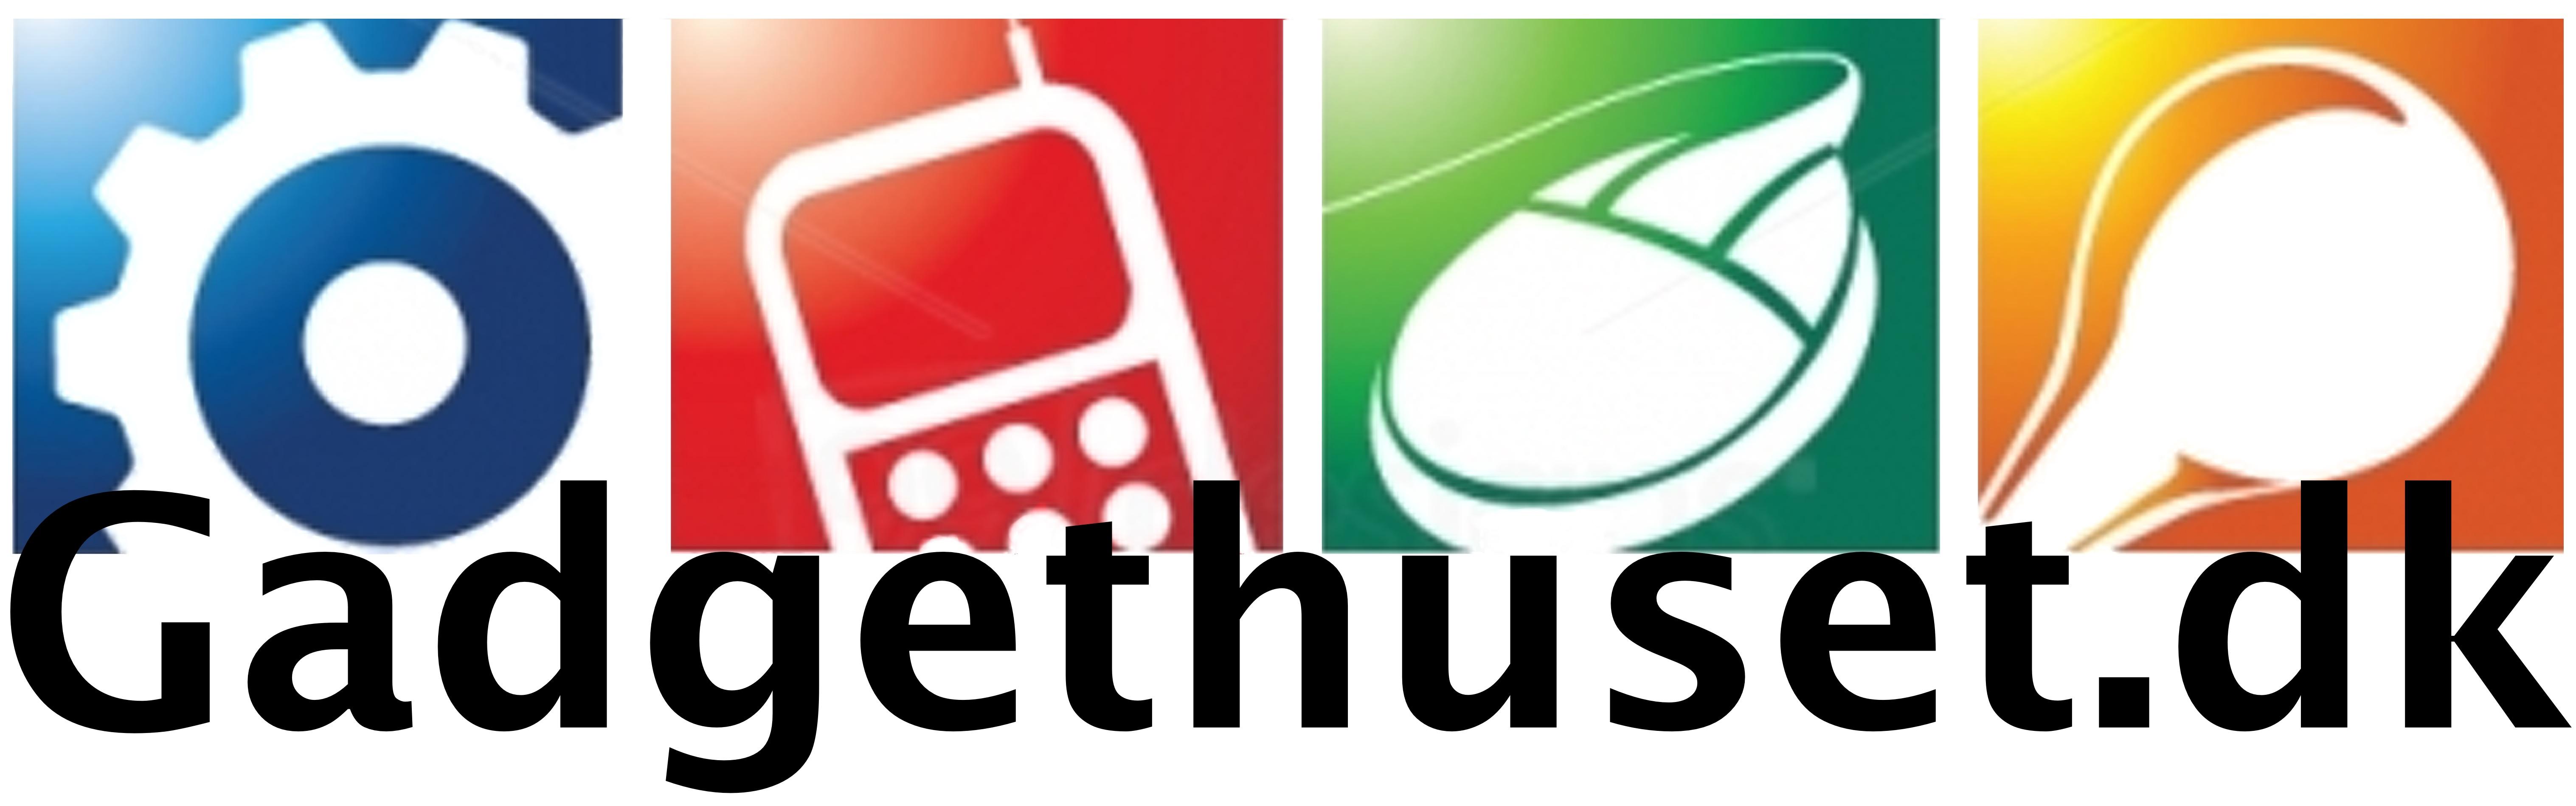 gadgethuset.dk logo